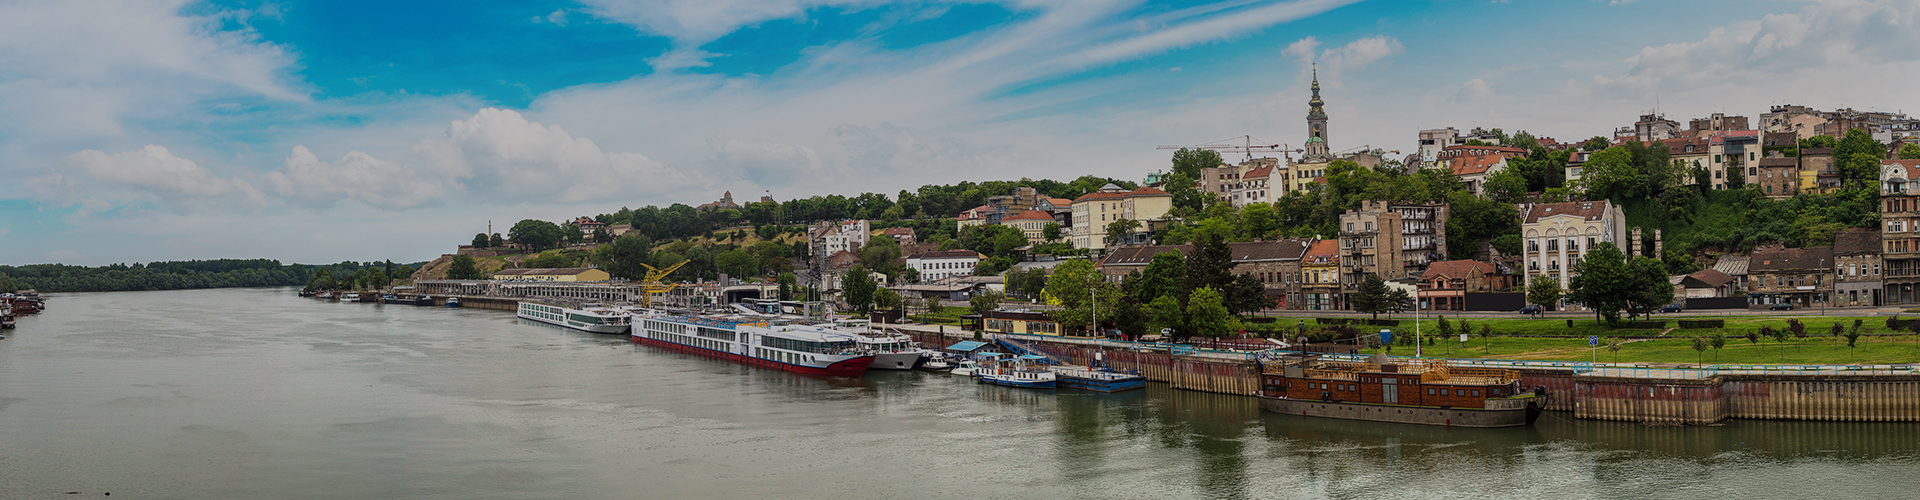 Landmark photograph of Serbia